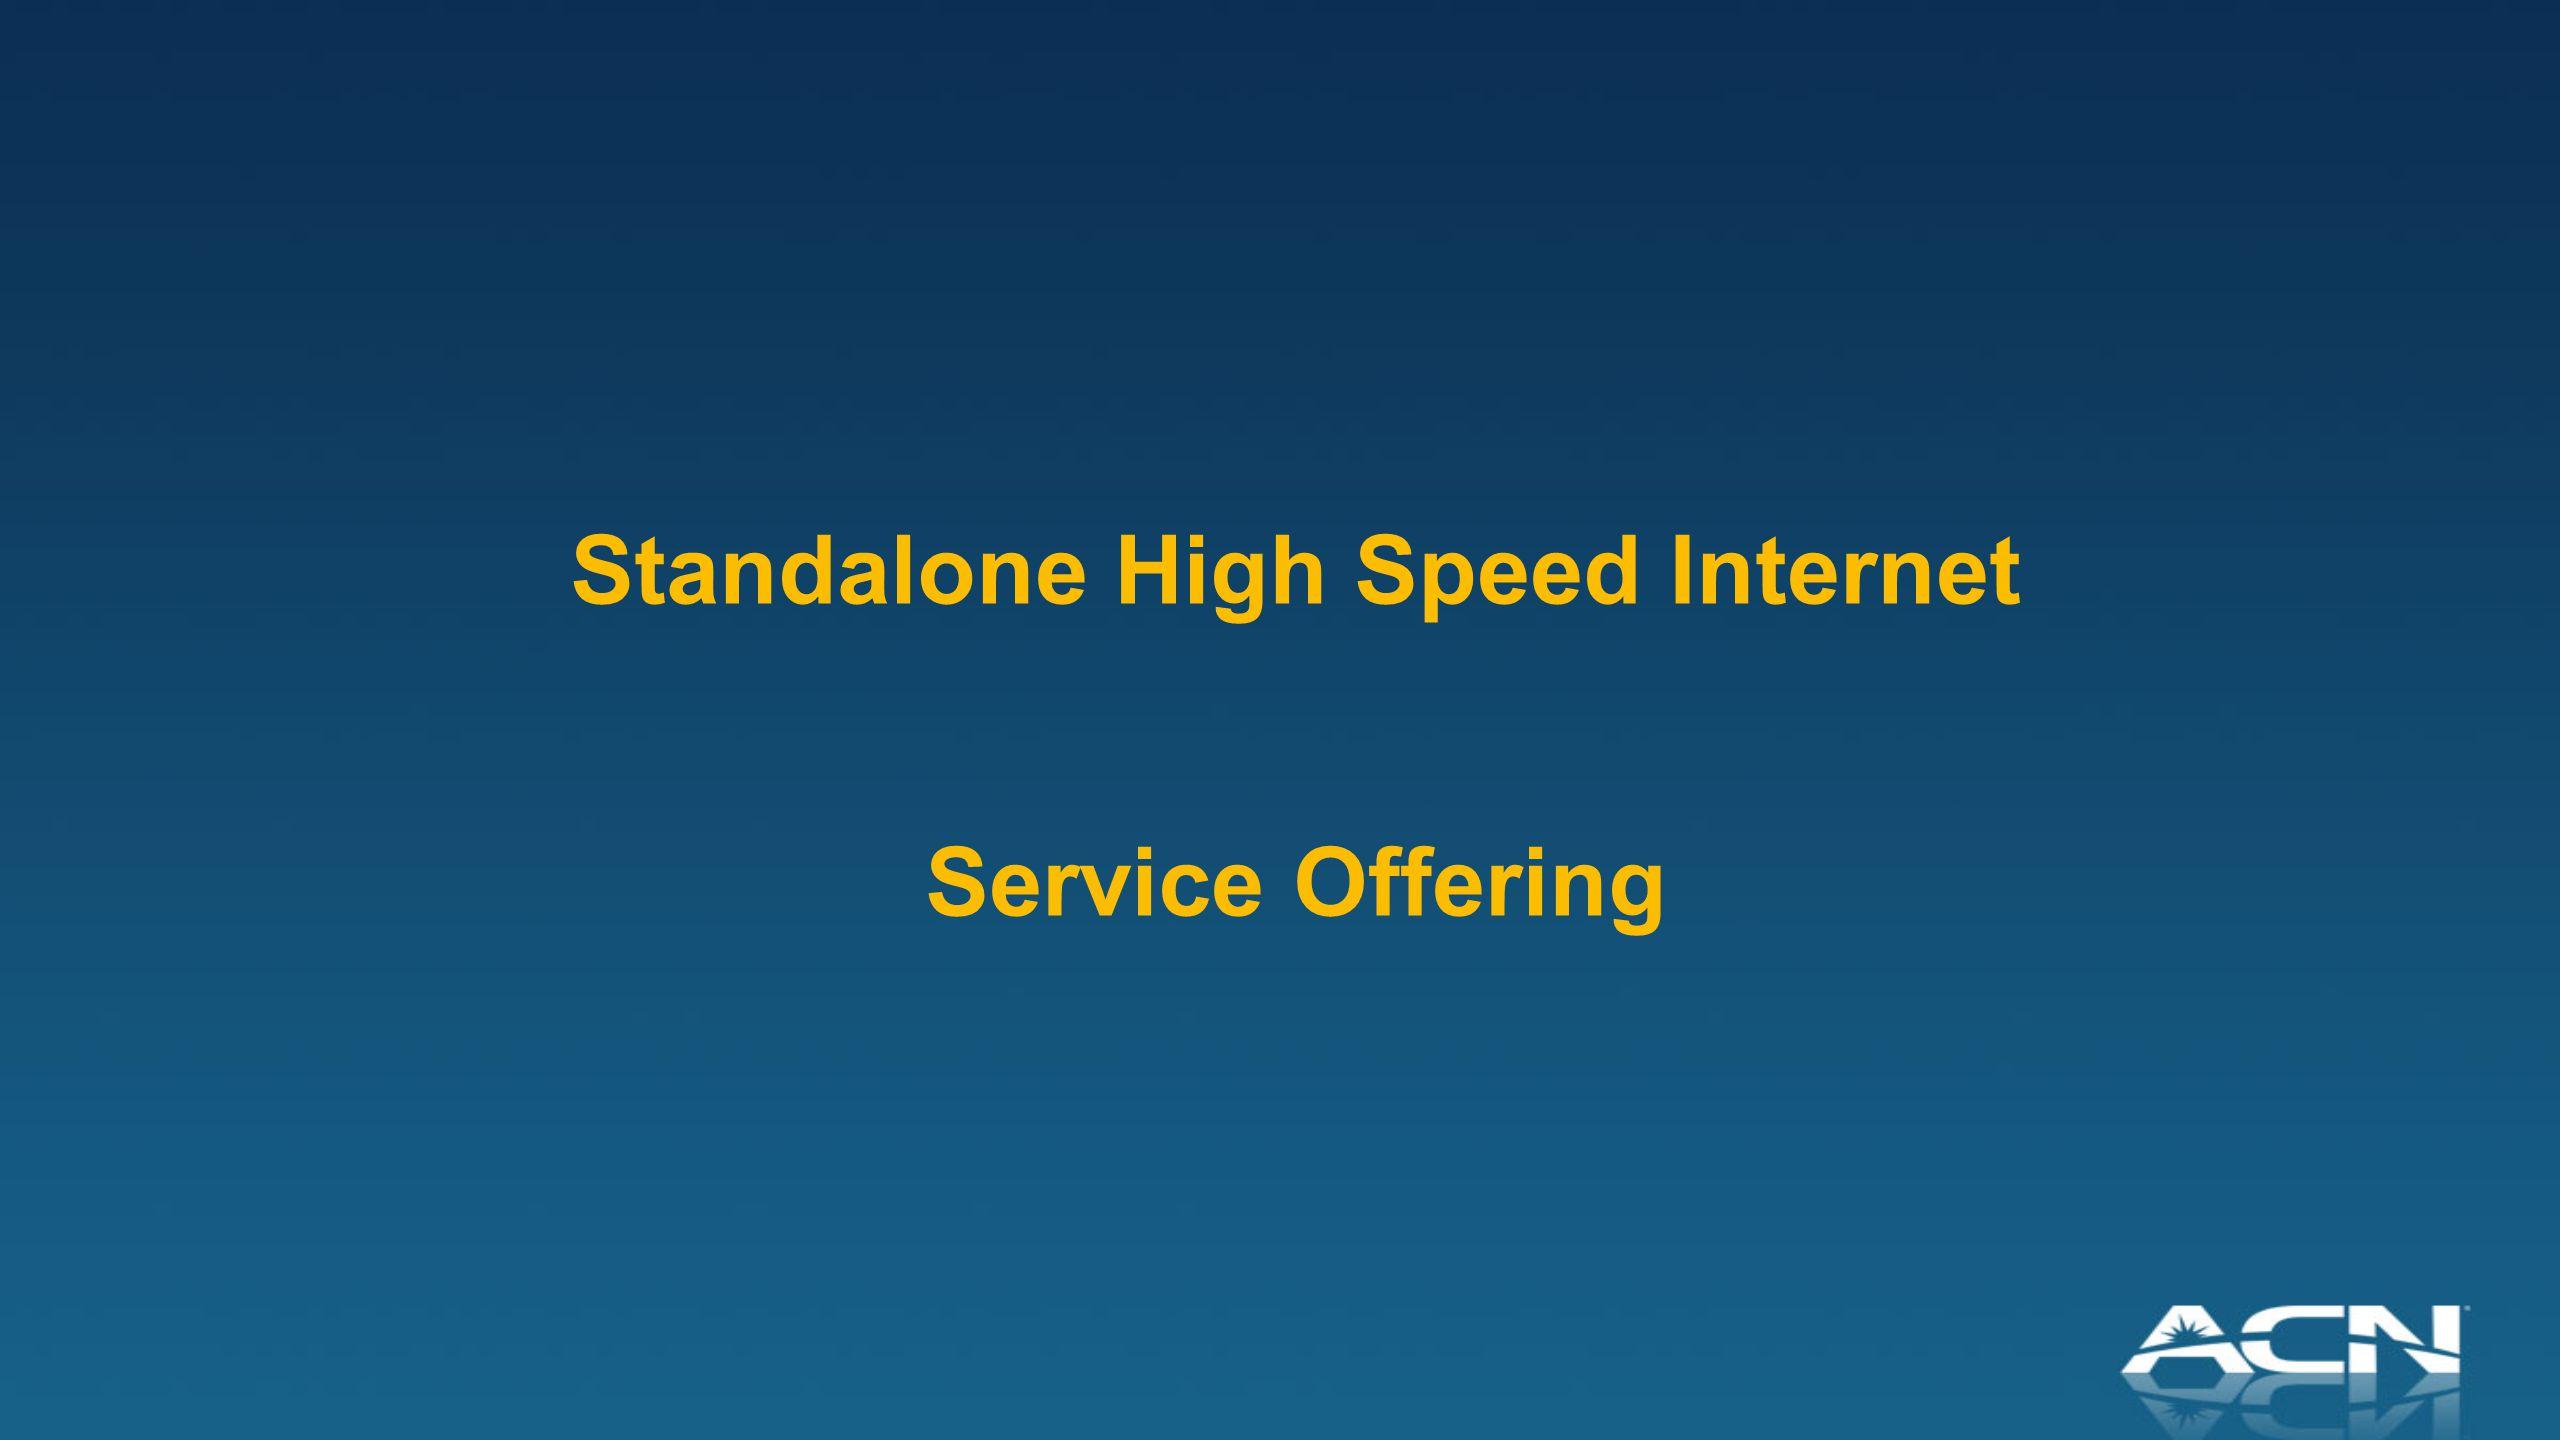 Standalone High Speed Internet Service Offering